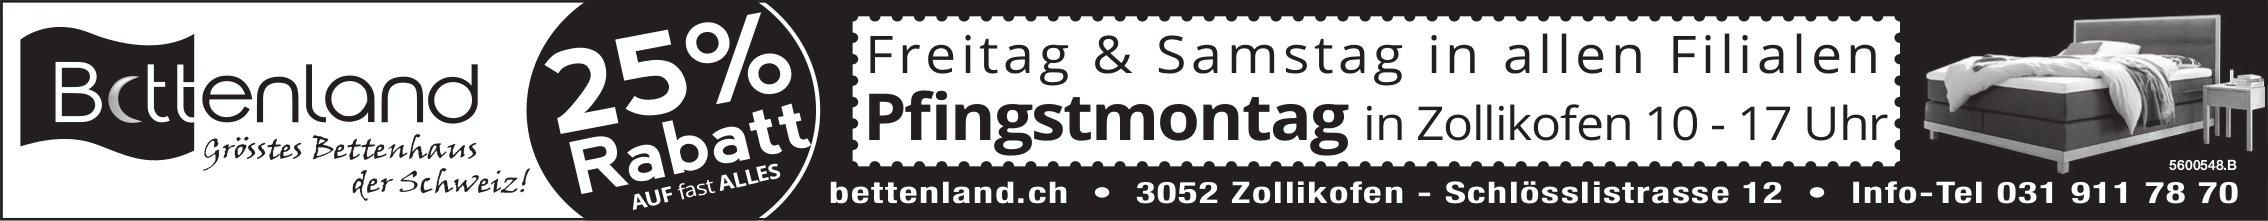 Bettenland - 25% Rabatt Freitag & Samstag + Pfingstmontag in Zollikofen